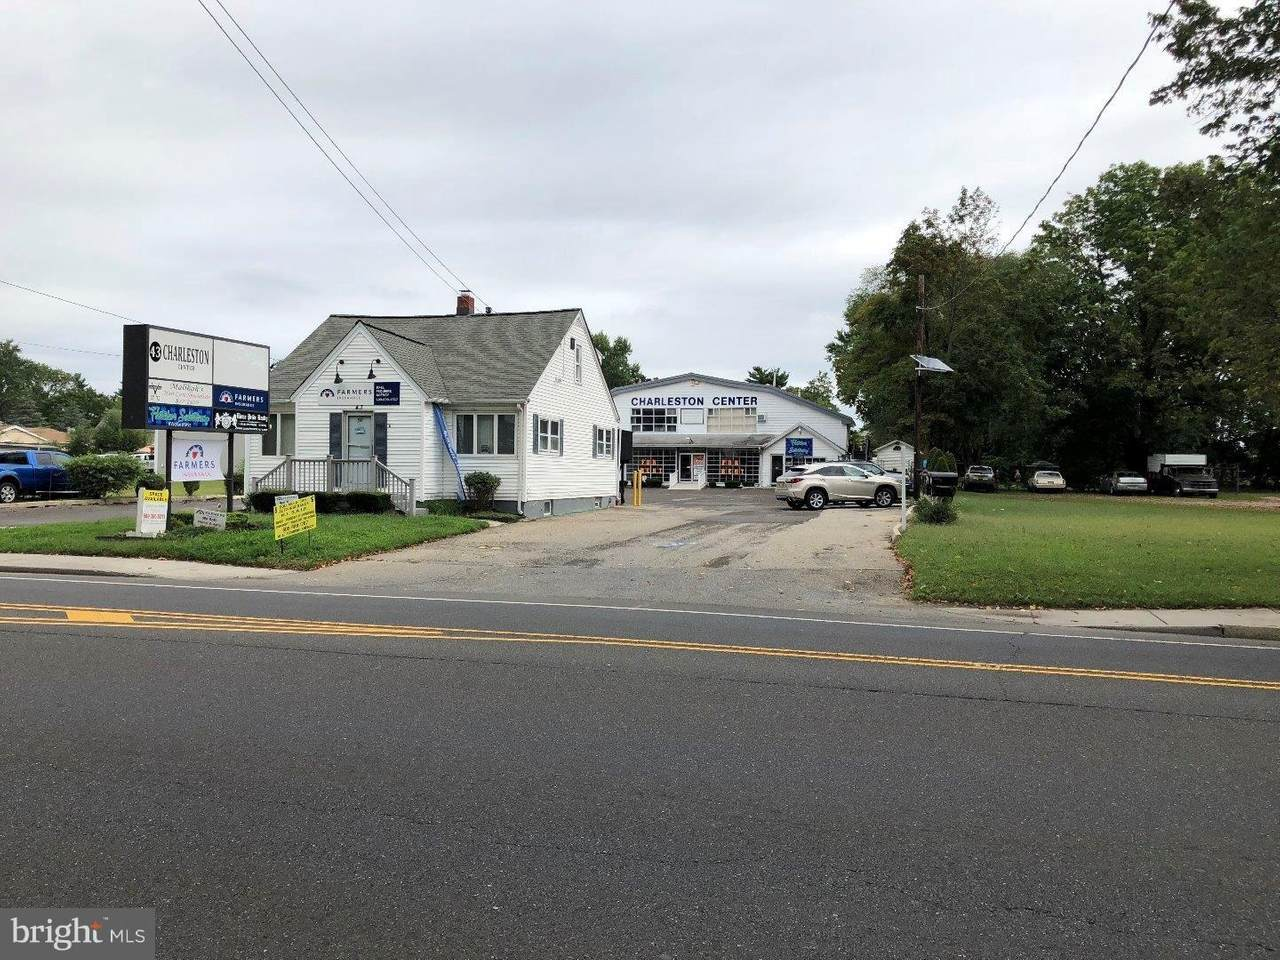 43 Charleston Road - Photo 1